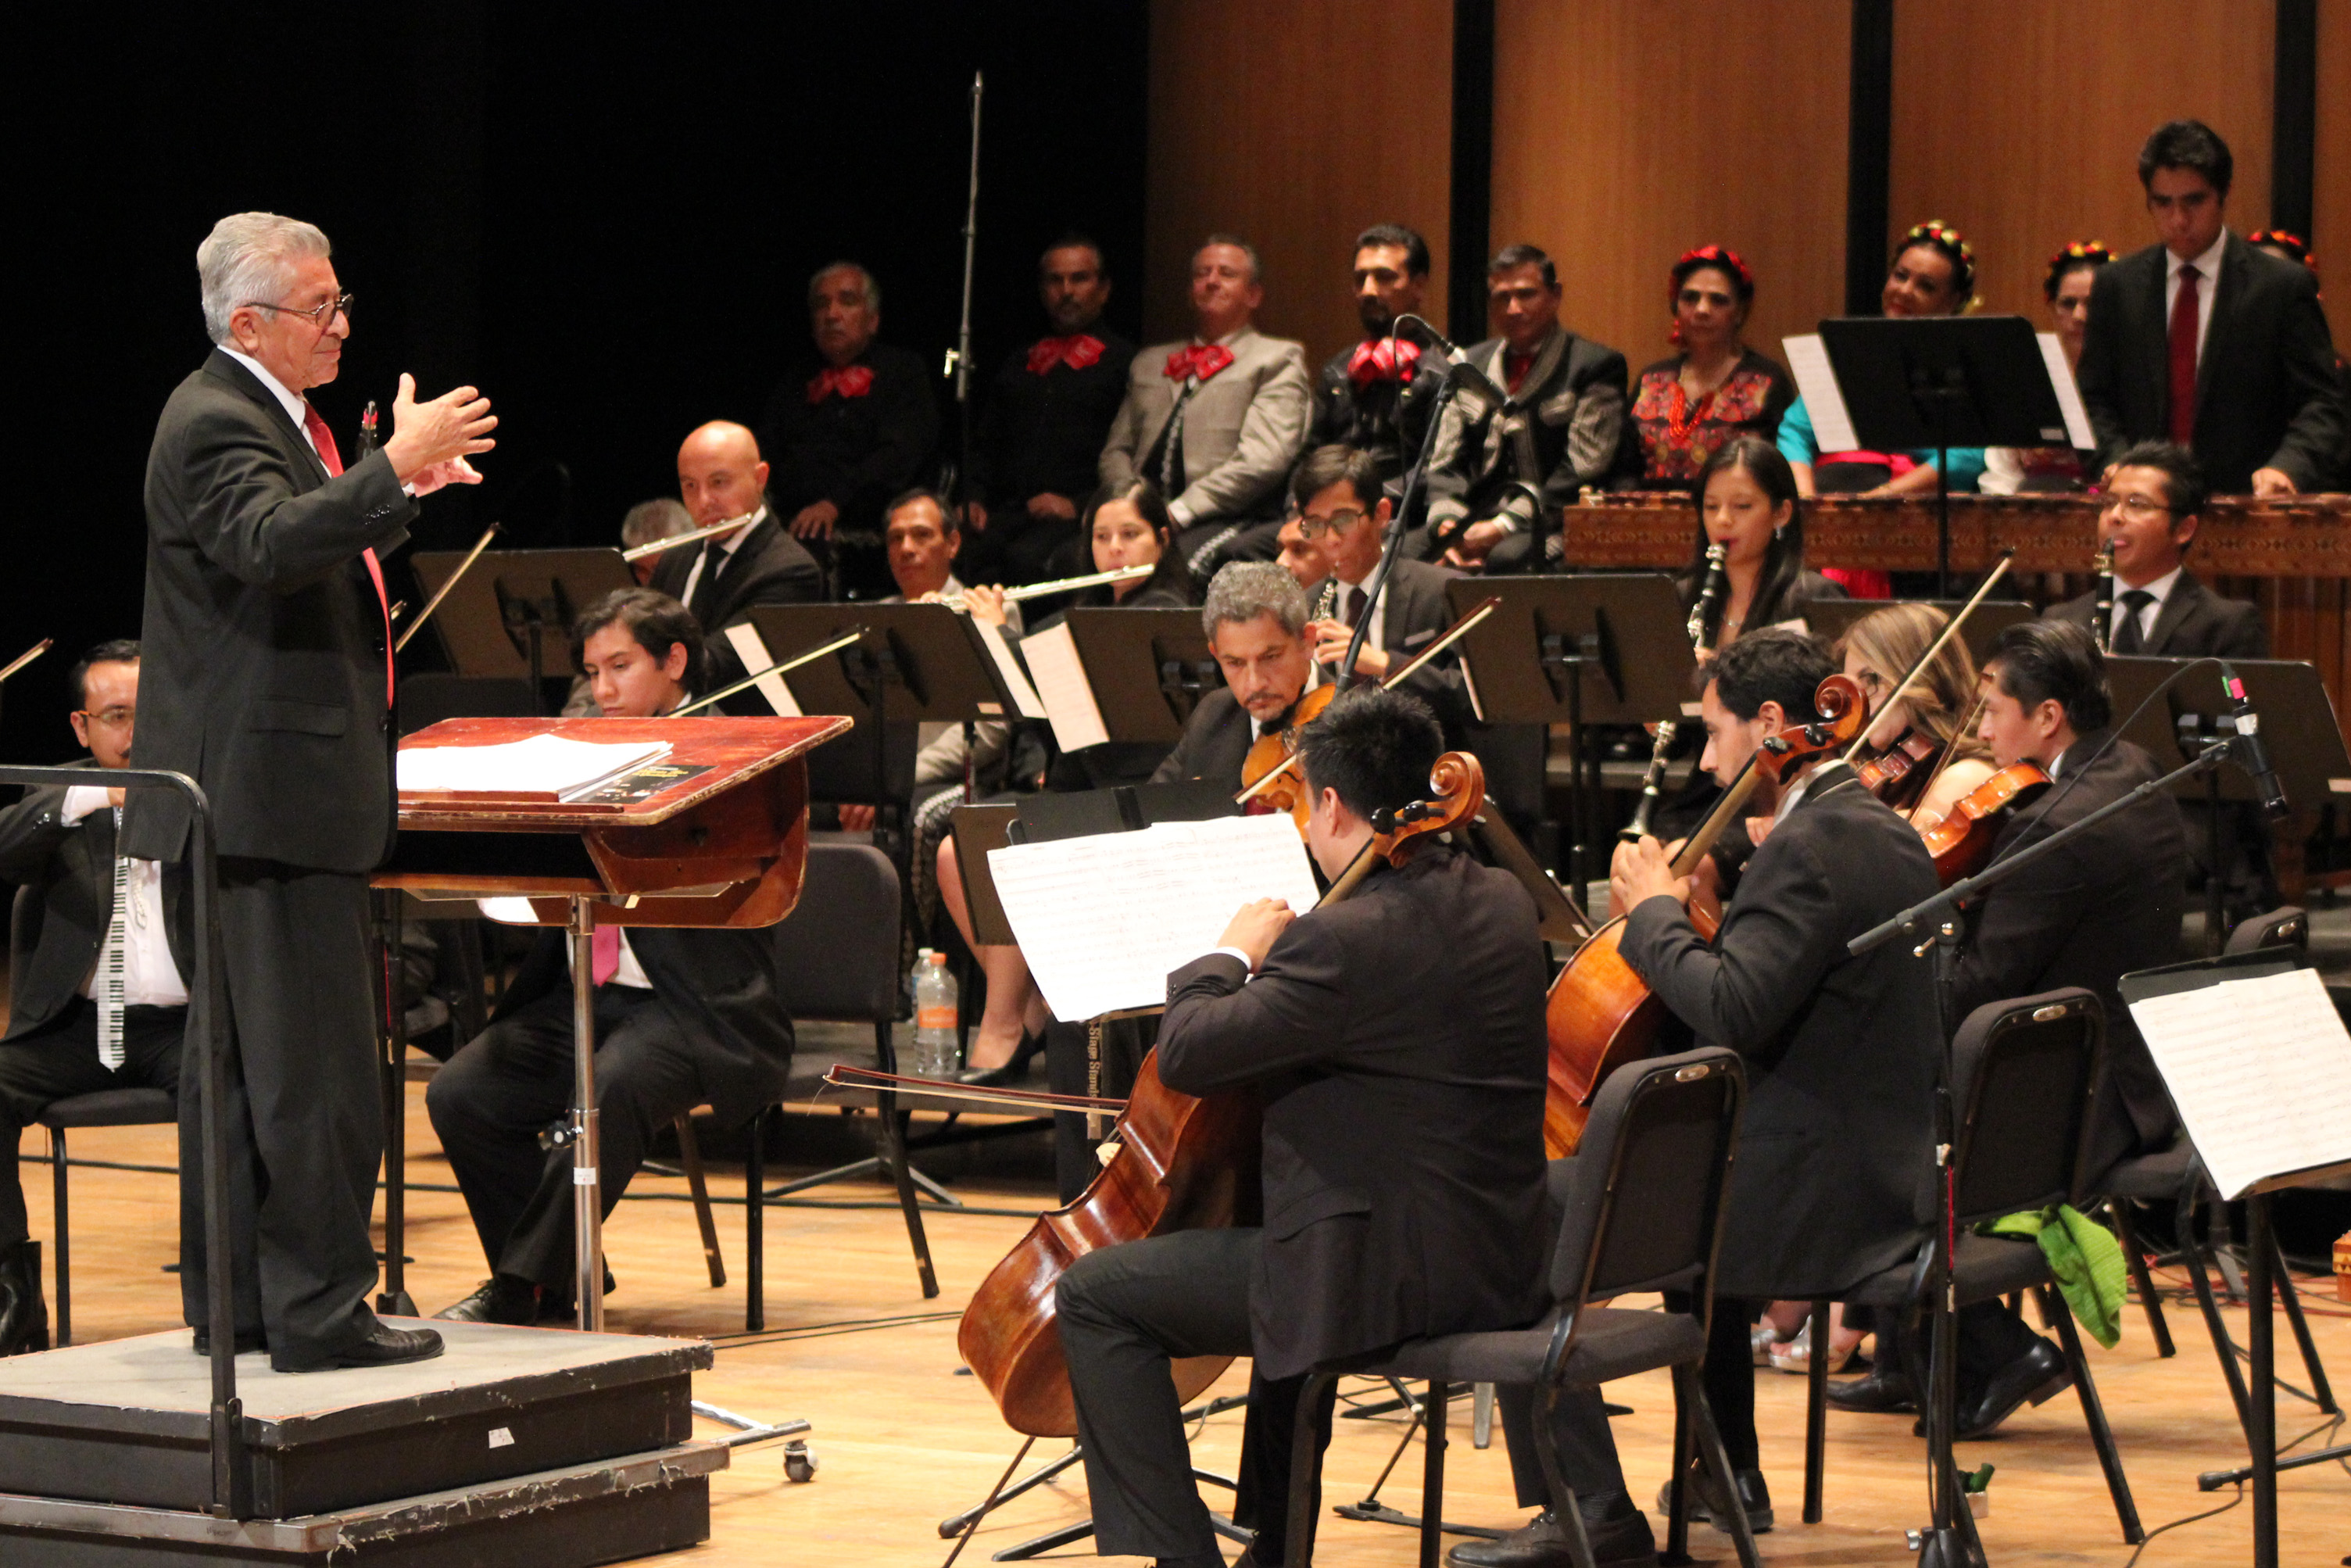 Celebra 39 Aniversario la Orquesta Típica de Guadalajara